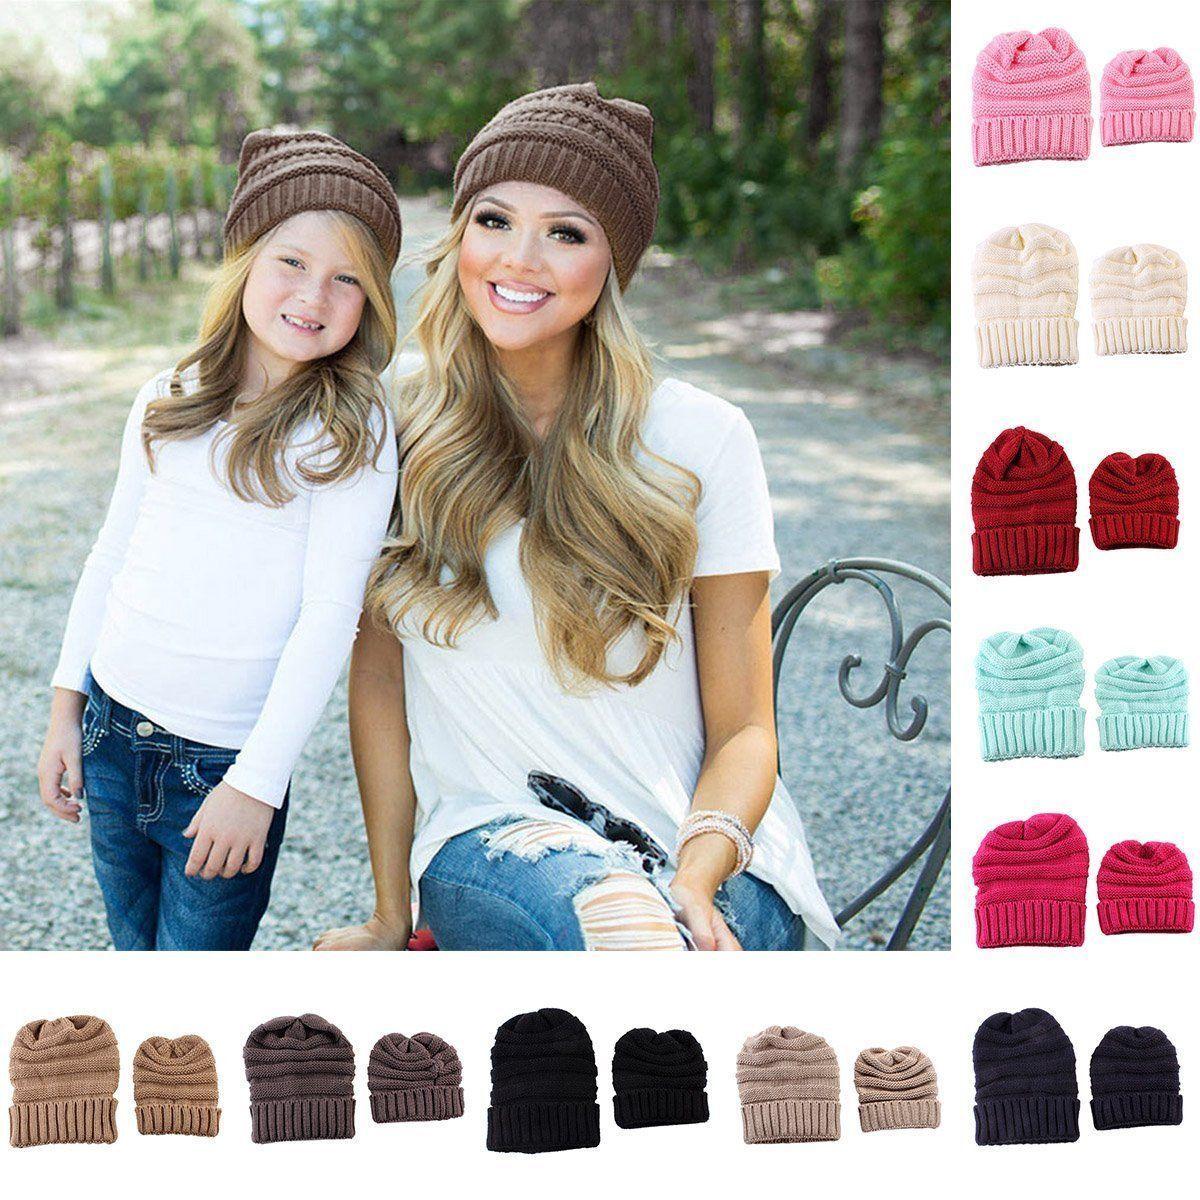 7d51fe44316 2Pcs Women Mom Mother Baby Child Warm Winter Knit Beanie Hat Crochet Ski  Cap Set